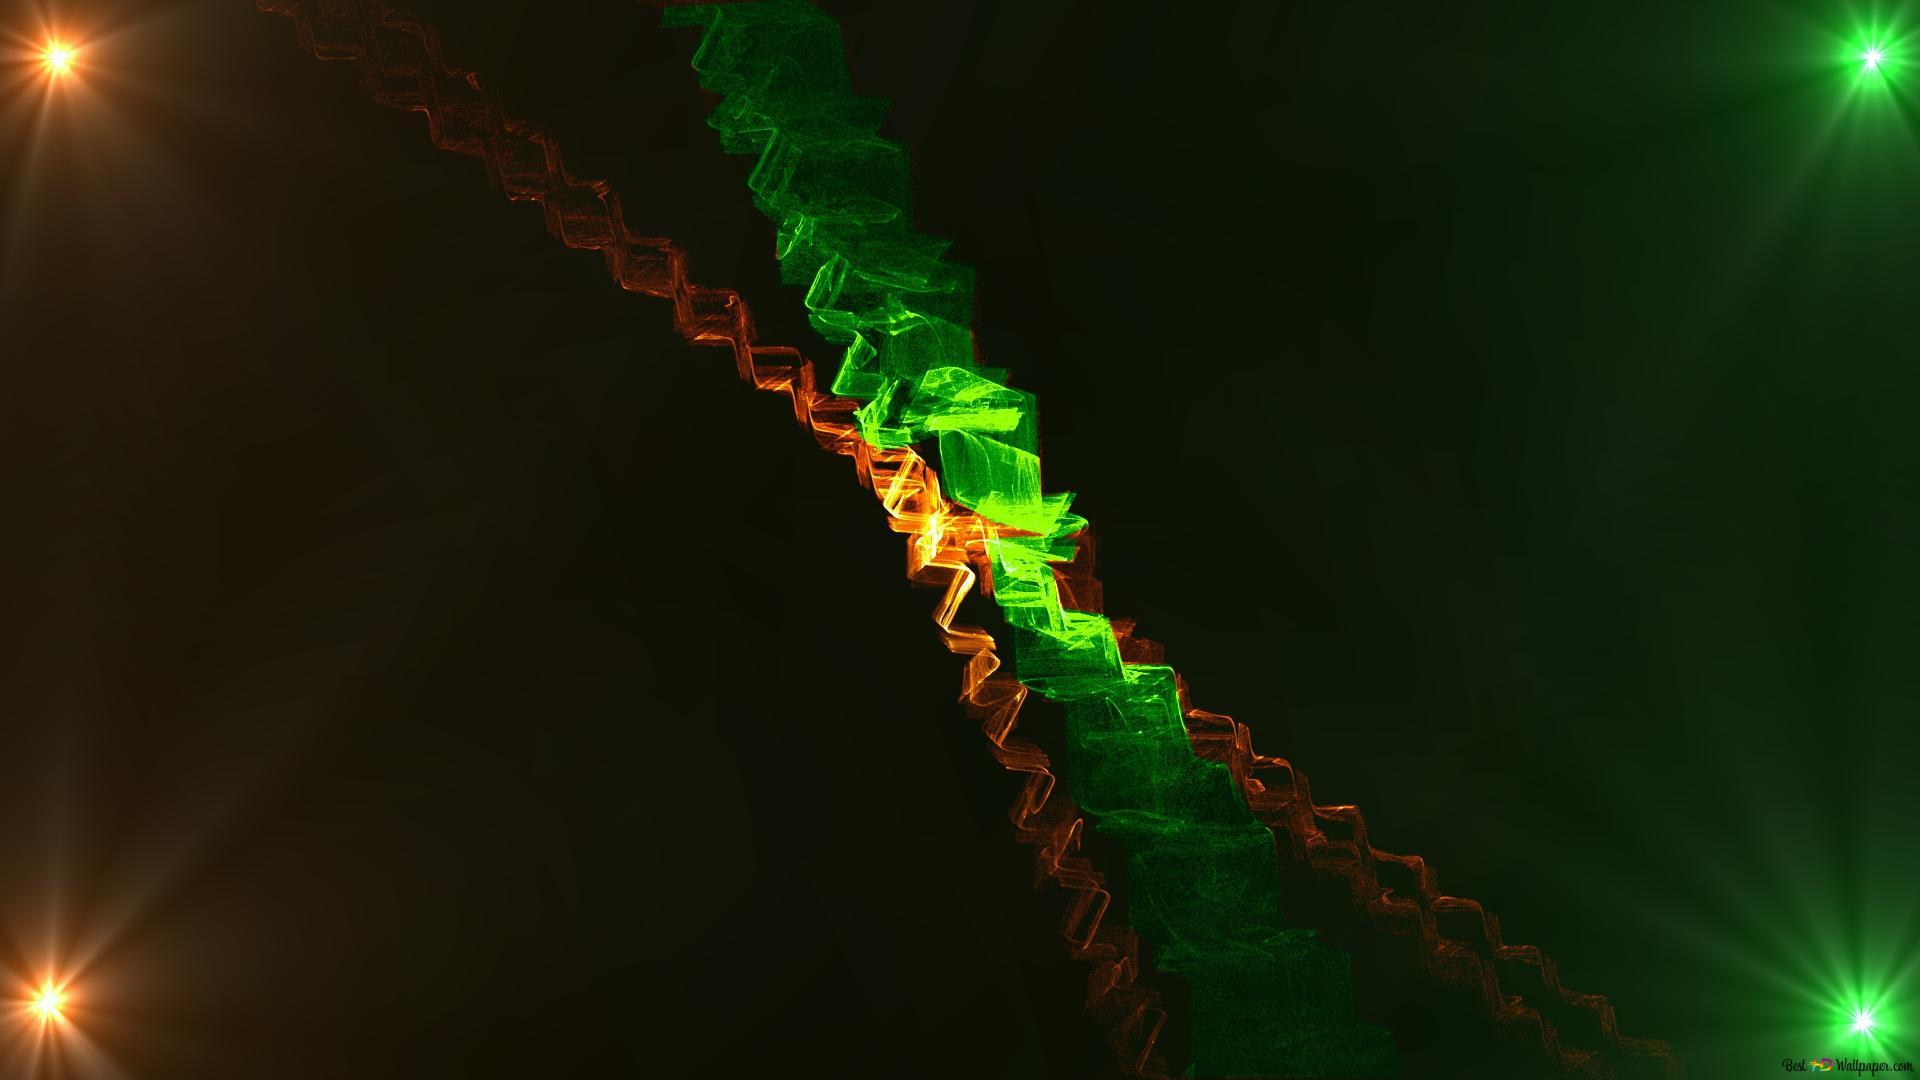 twisted twirl lightning wallpaper 1920x1080 12606 48